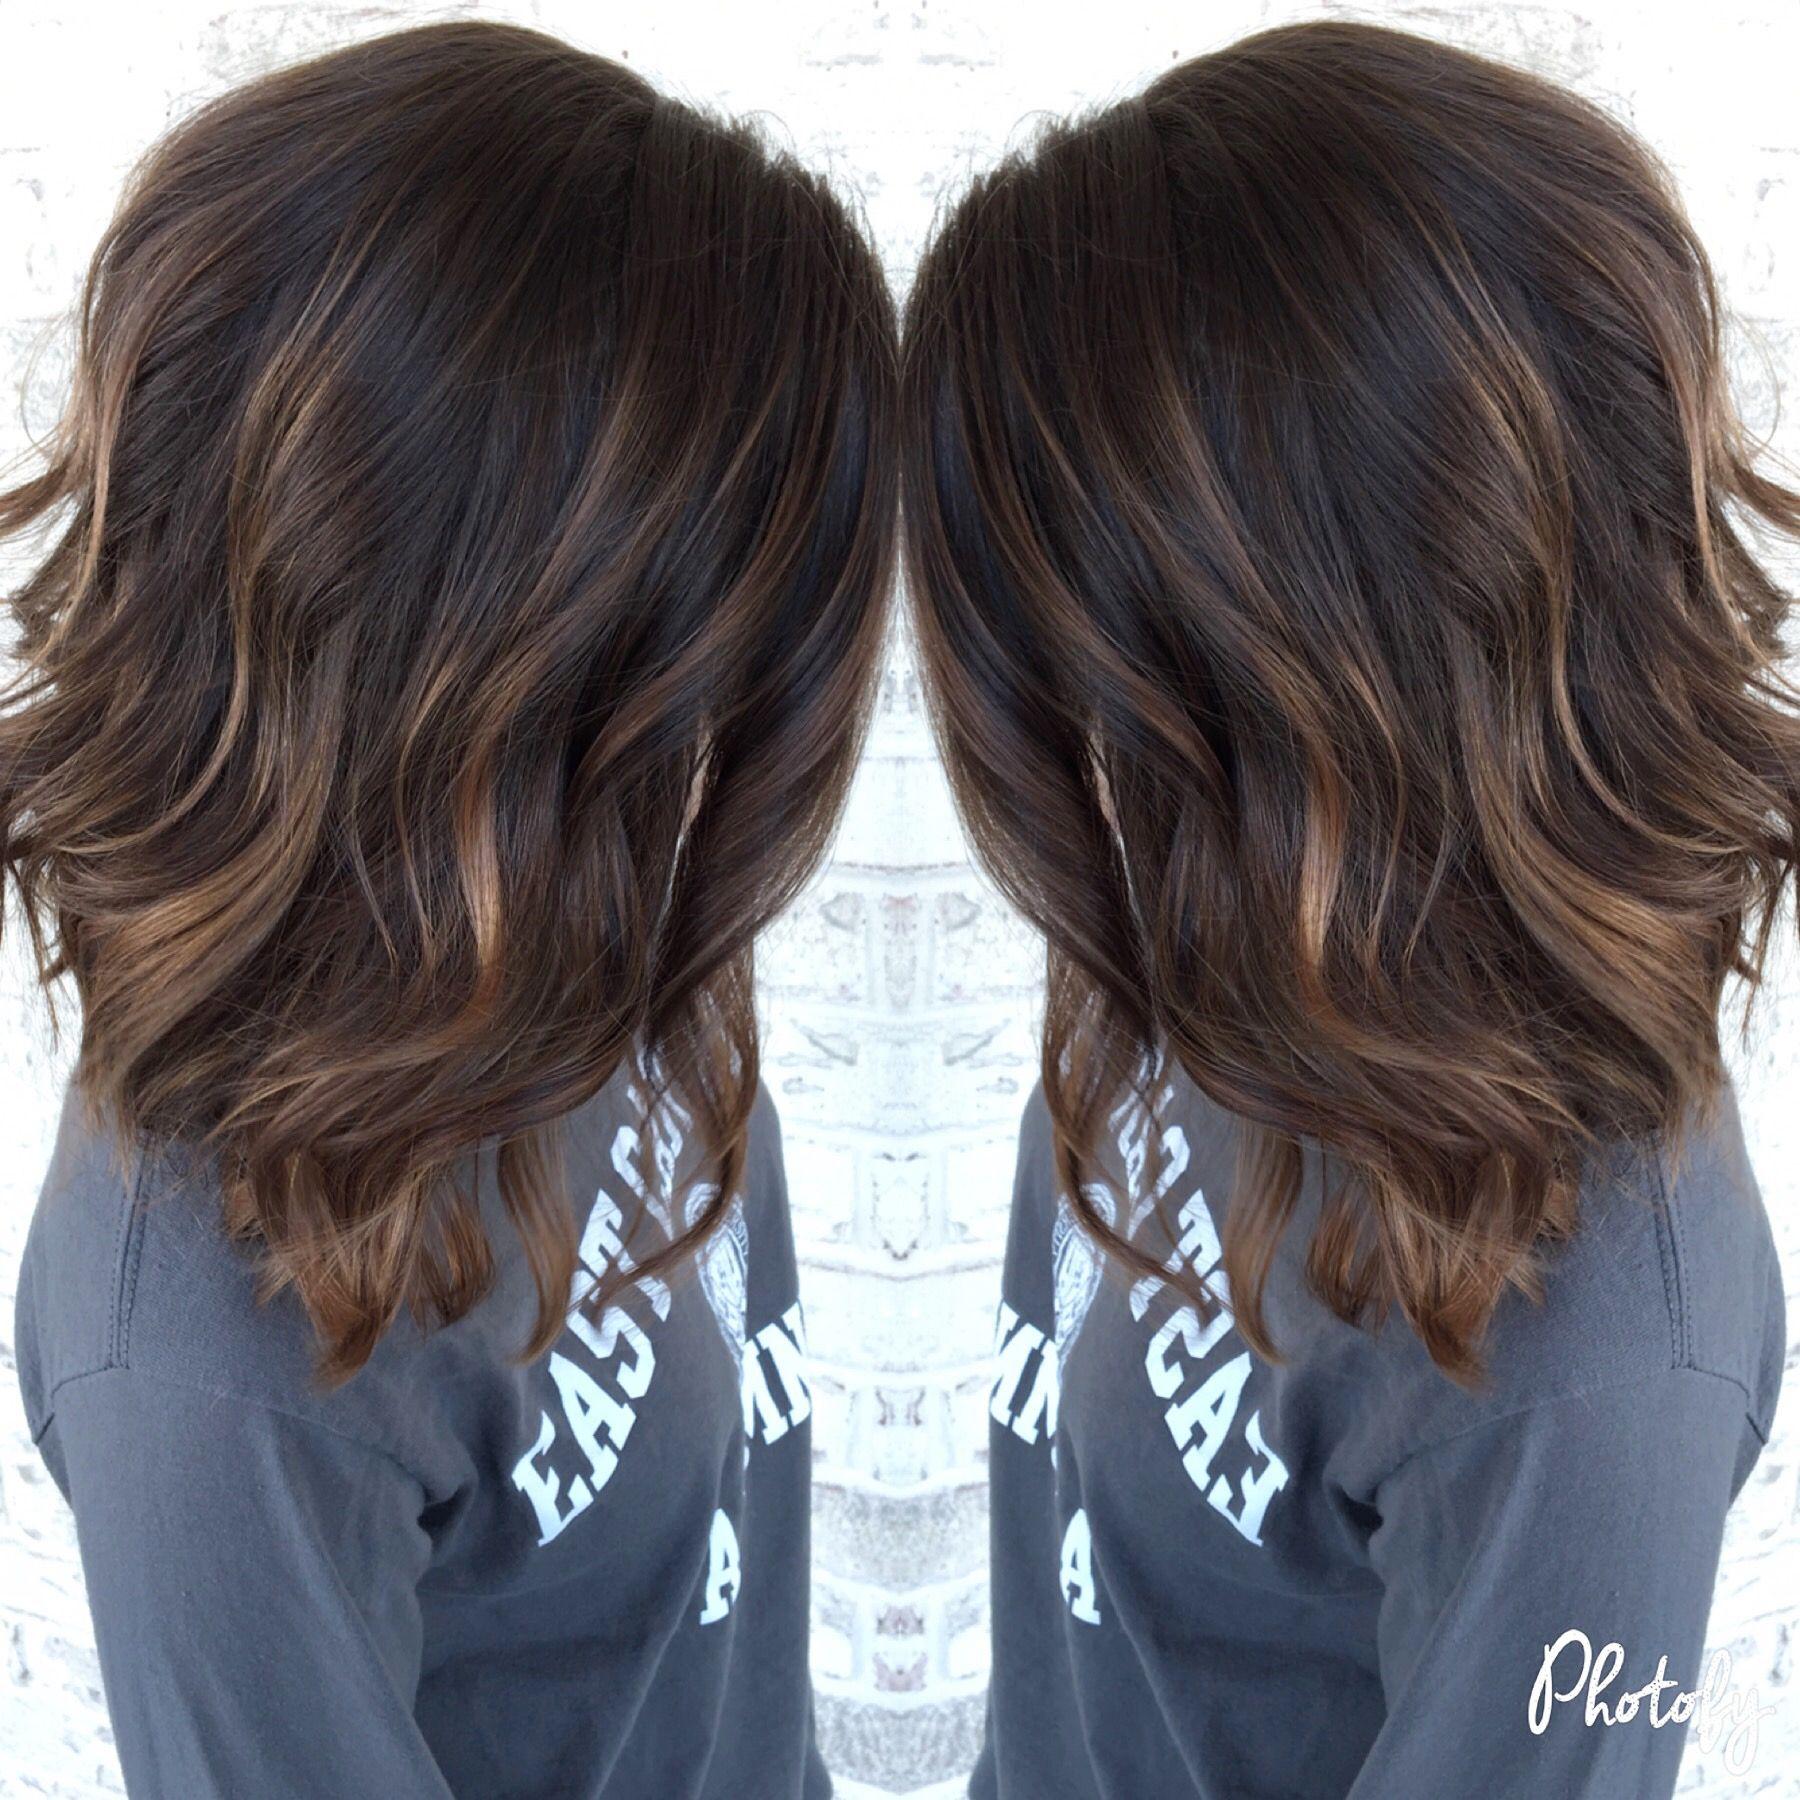 Beautiful Subtle Balayage Hair Color Flamboyage Brown Hair With Highlights Hair Highlights